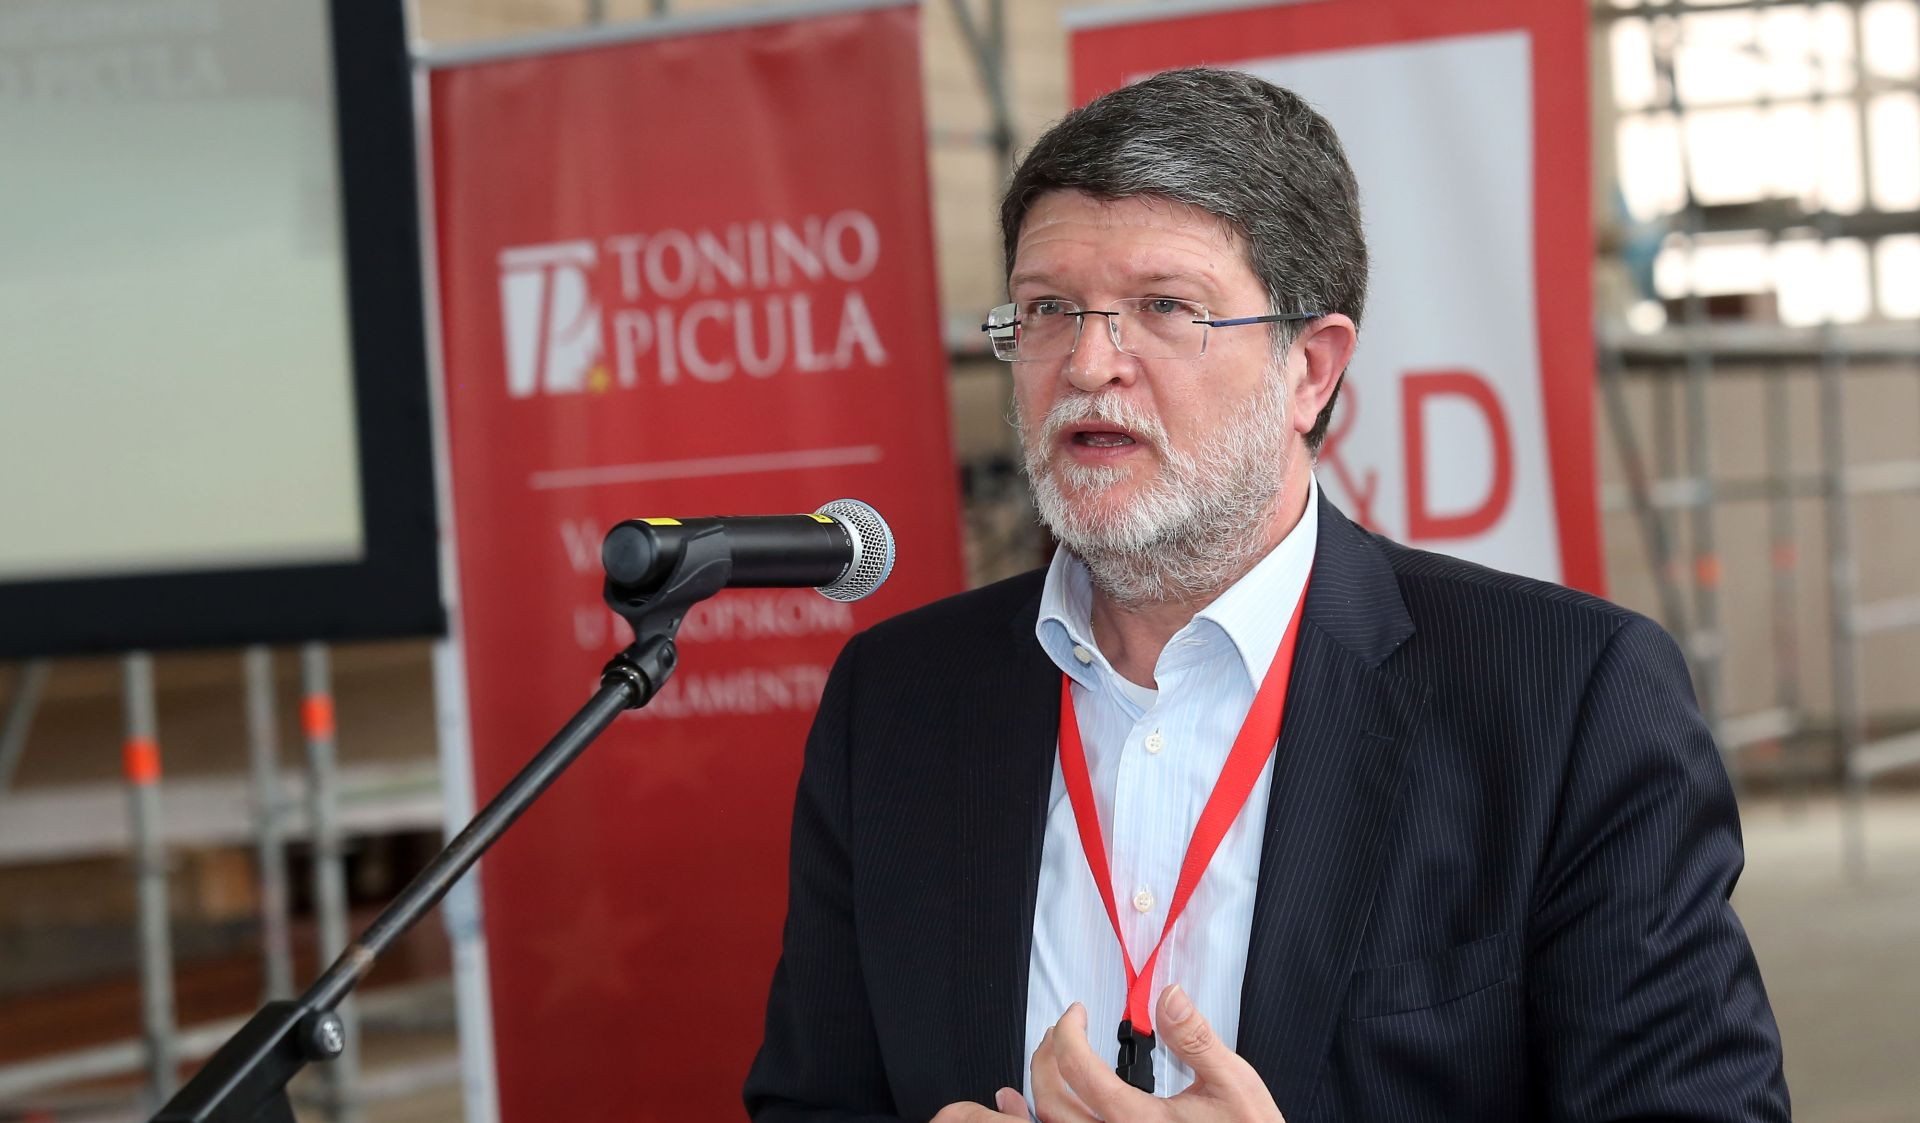 Tonino Picula pojasnio kako SDP misli voditi iz Bruxellesa